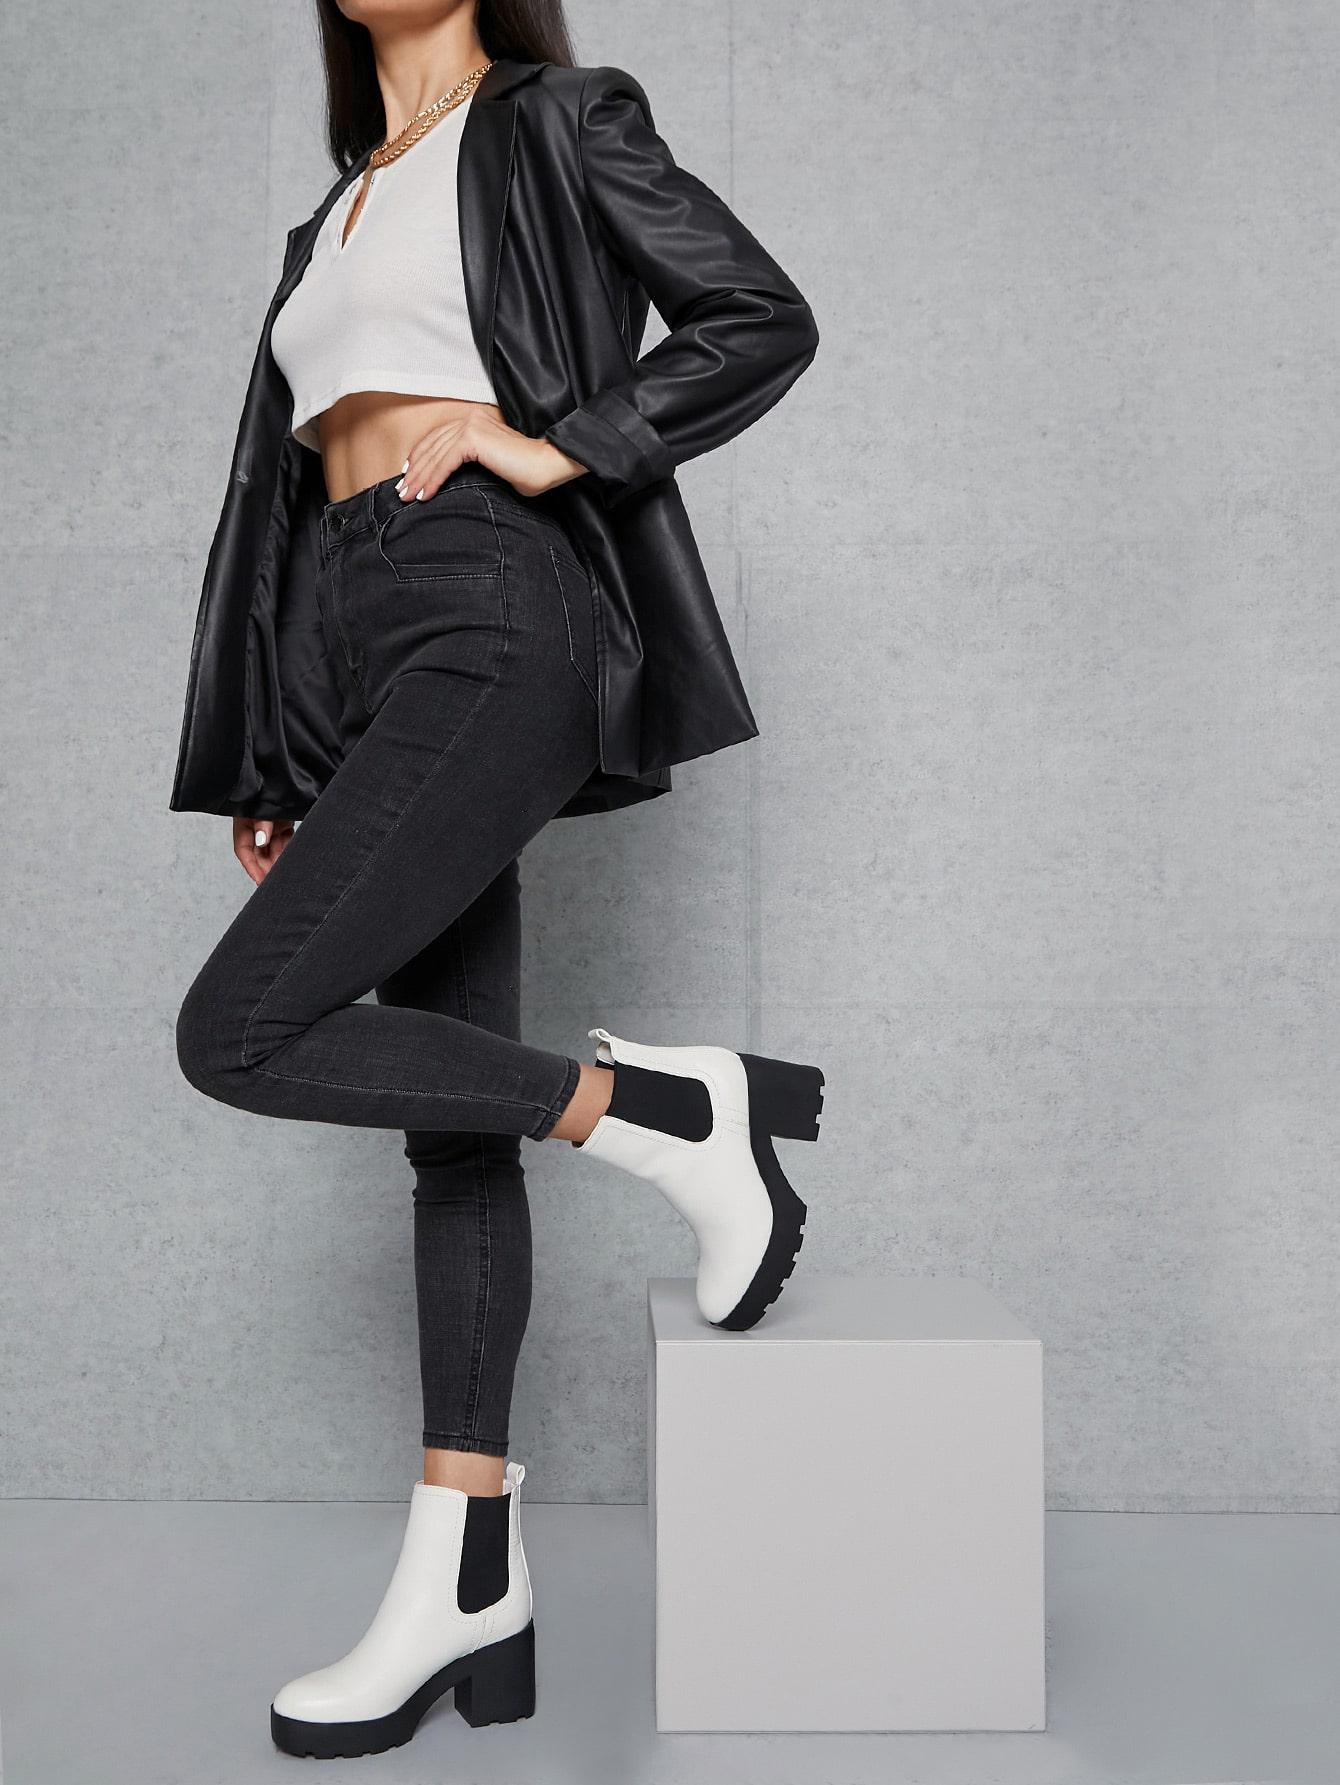 Vegan Leather High Block Heel Platform Boots